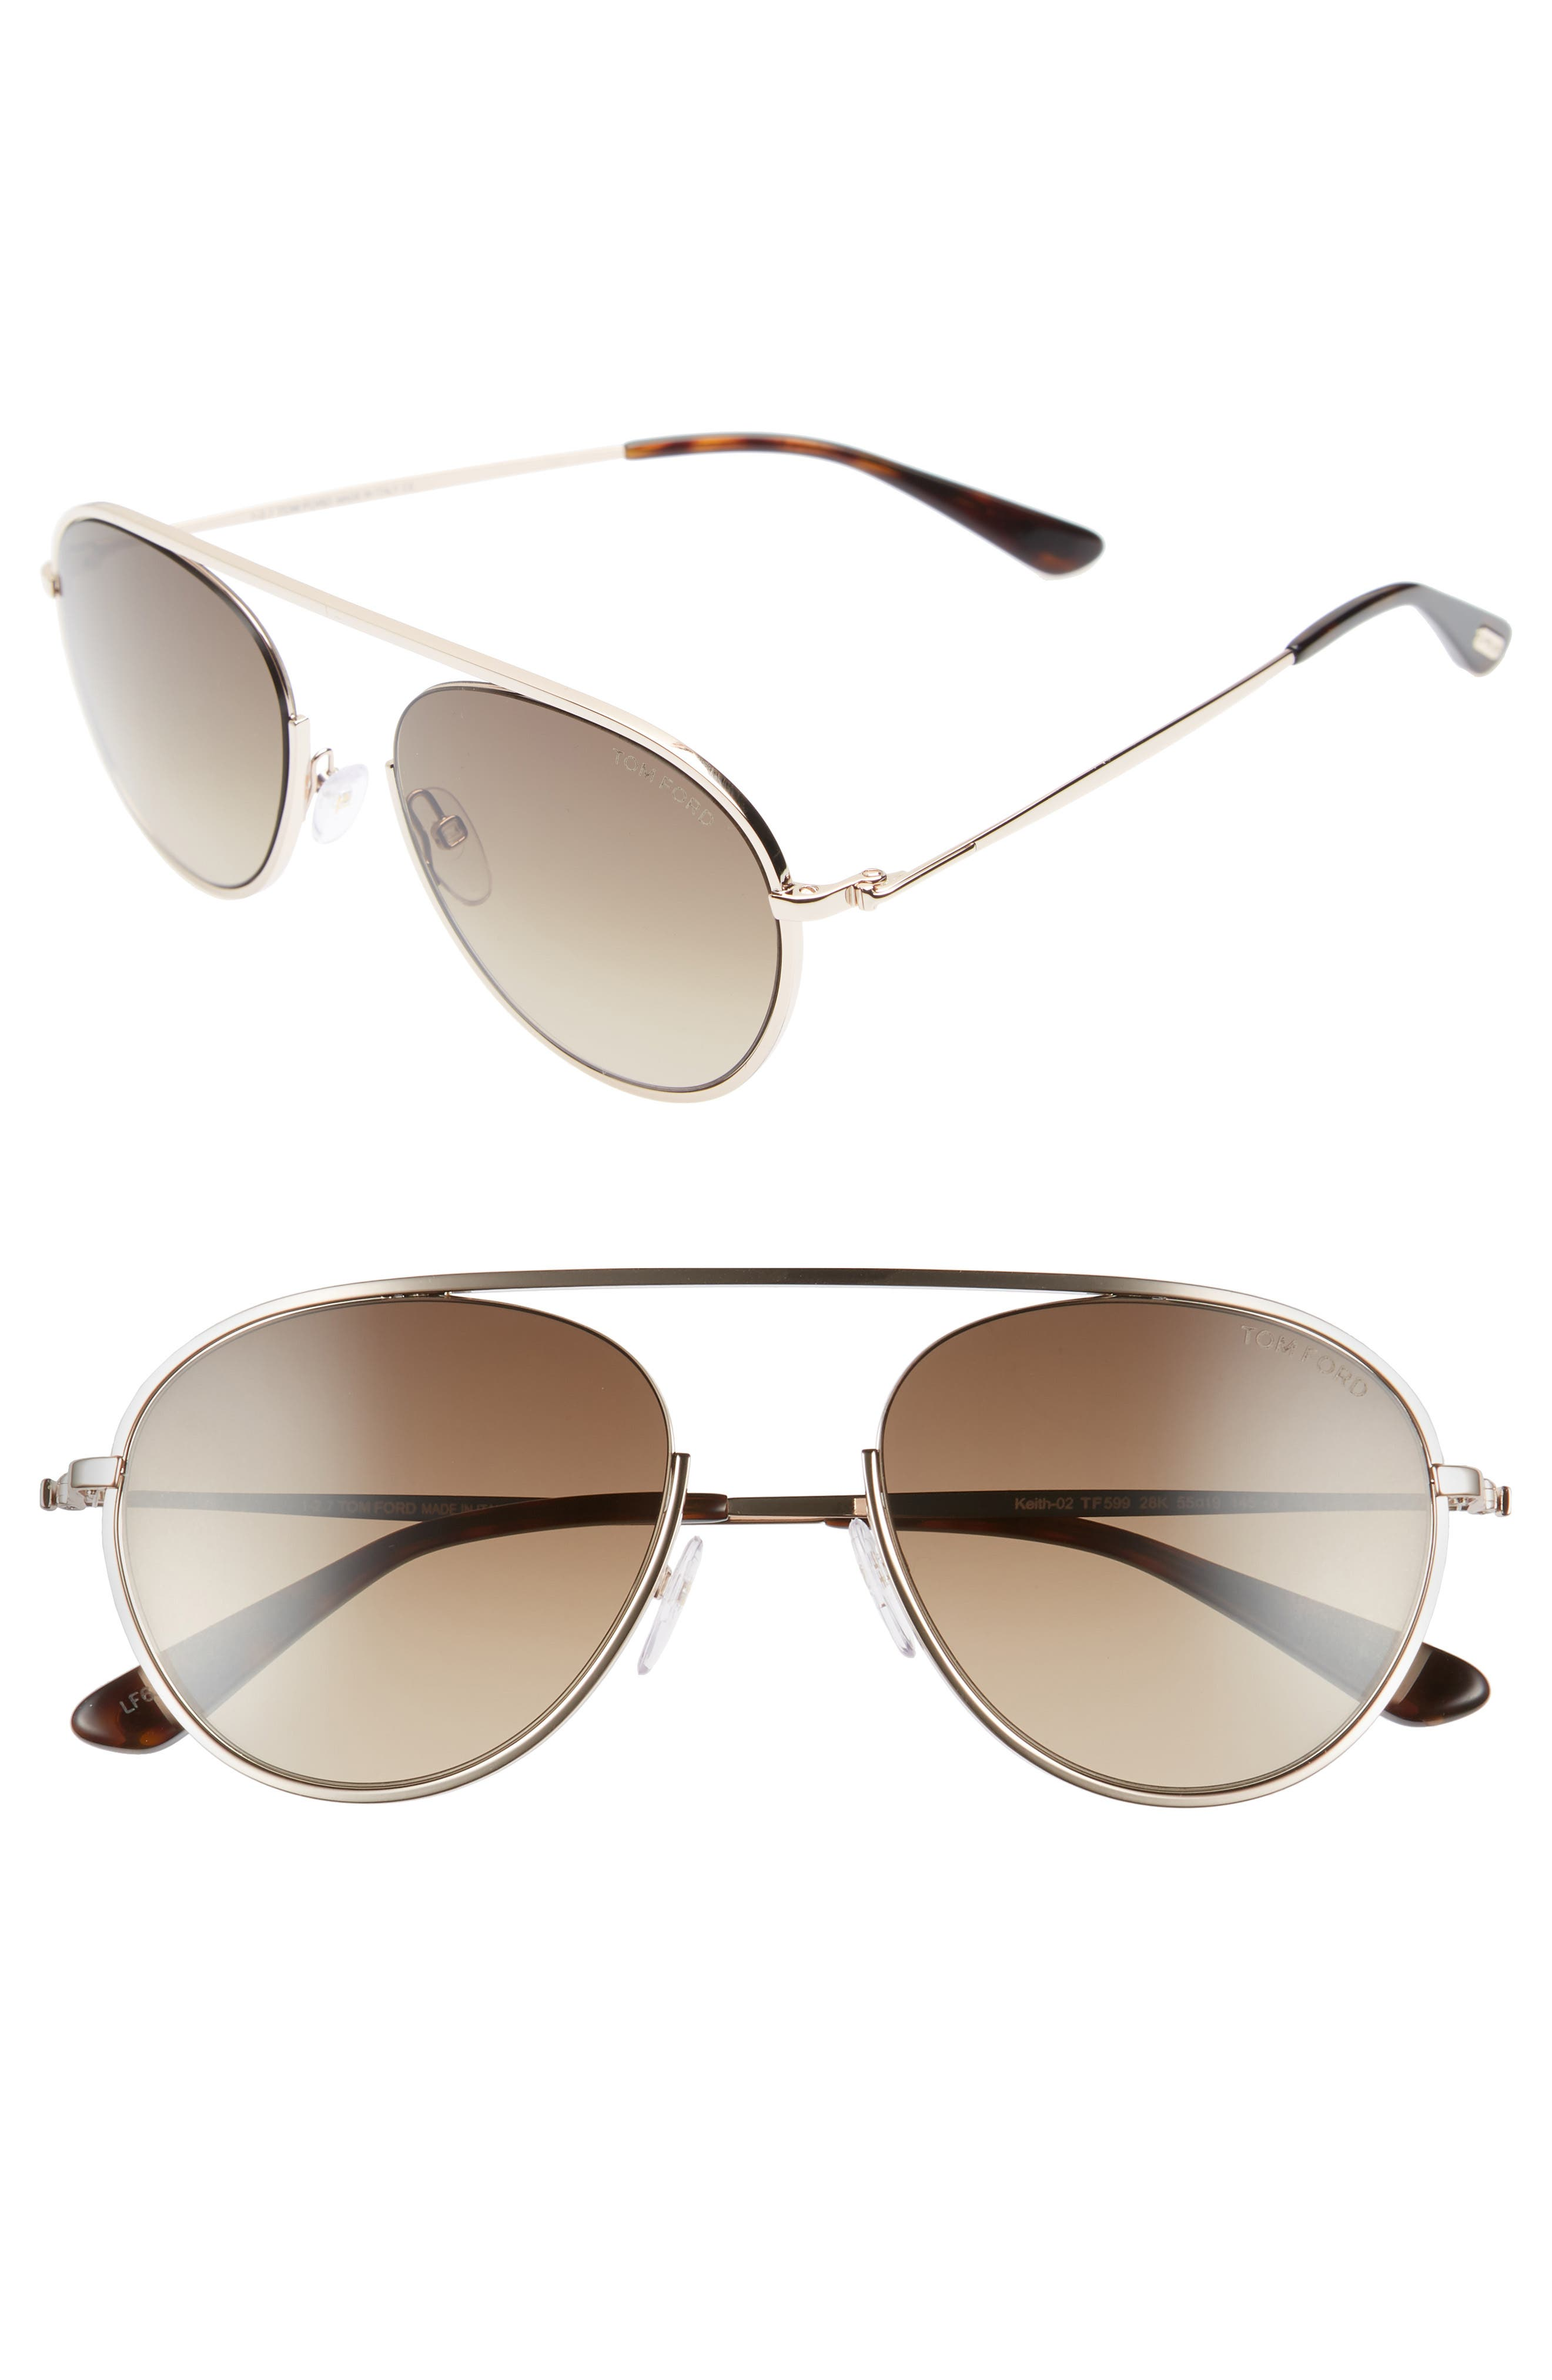 Tom Ford Keith 55mm Metal Aviator Sunglasses